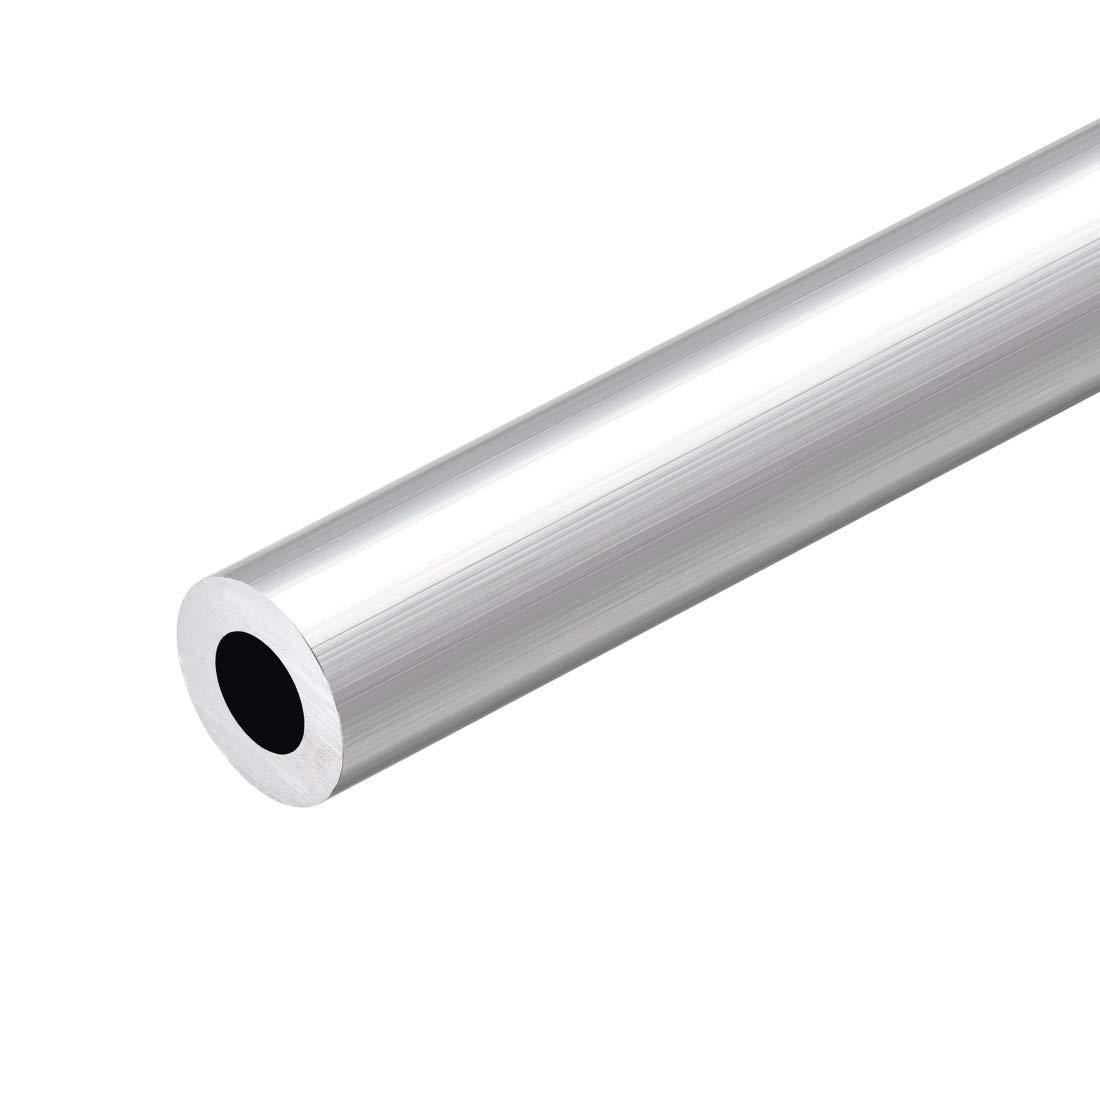 uxcell 6063 Aluminum Round Tube 300mm Length 19mm OD 9mm Inner Dia Seamless Aluminum Straight Tubing 2 Pcs